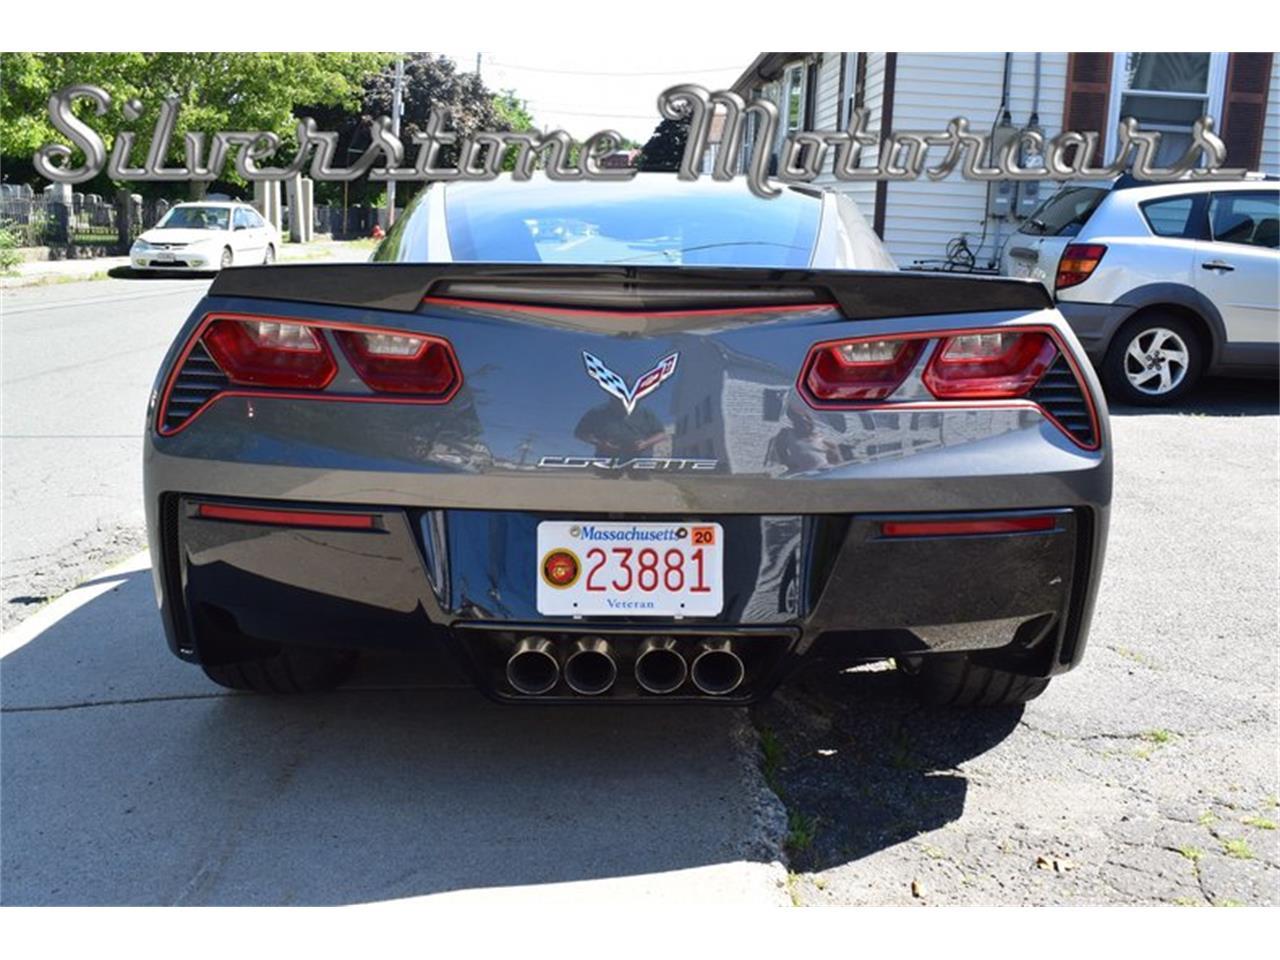 2015 Chevrolet Corvette (CC-1235192) for sale in North Andover, Massachusetts